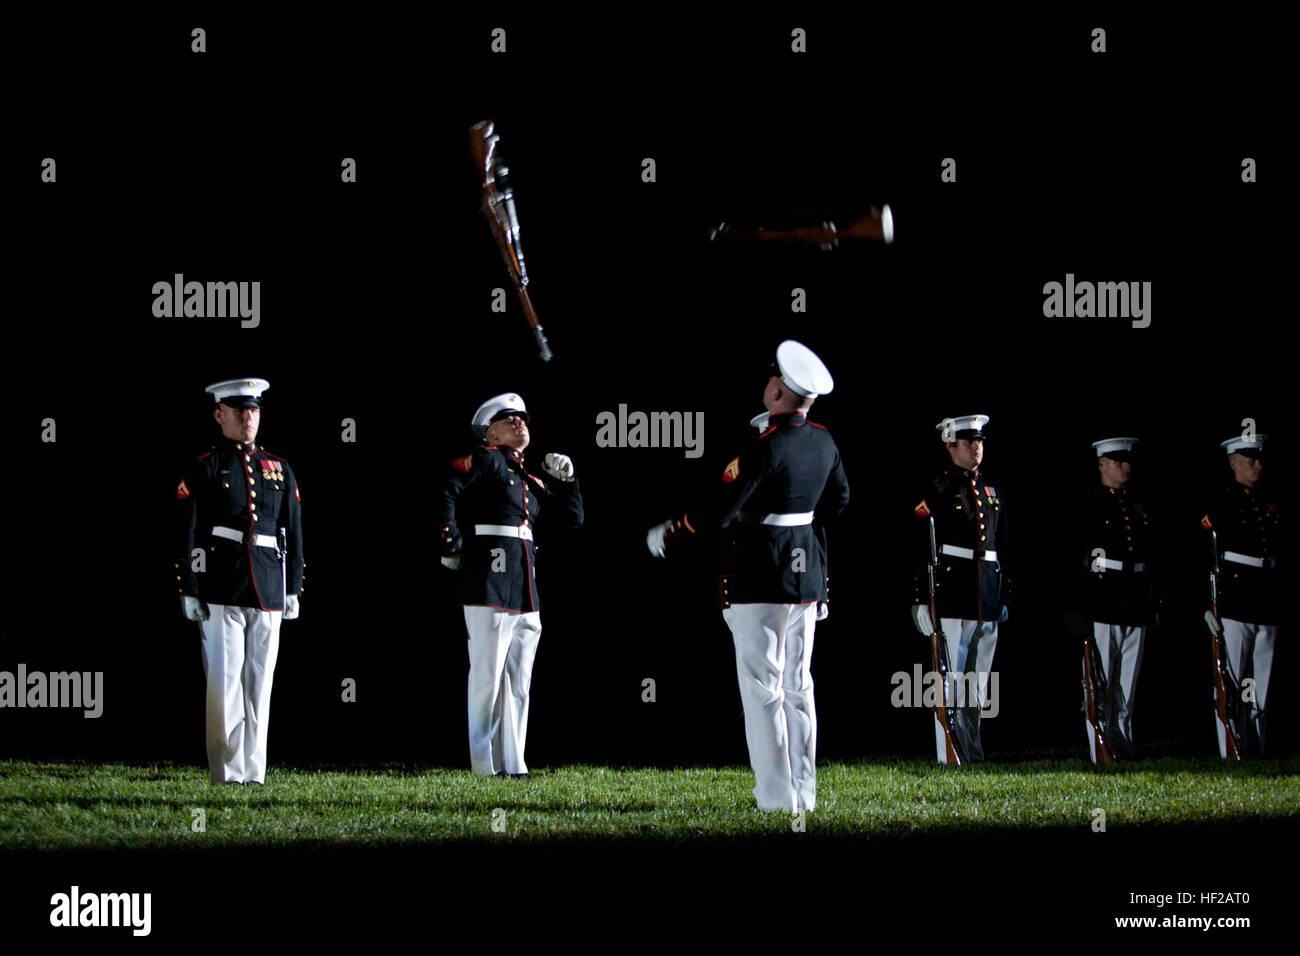 Members of the U.S. Marine Corps Silent Drill Platoon perform during an Evening Parade at Marine Barracks Washington Stock Photo